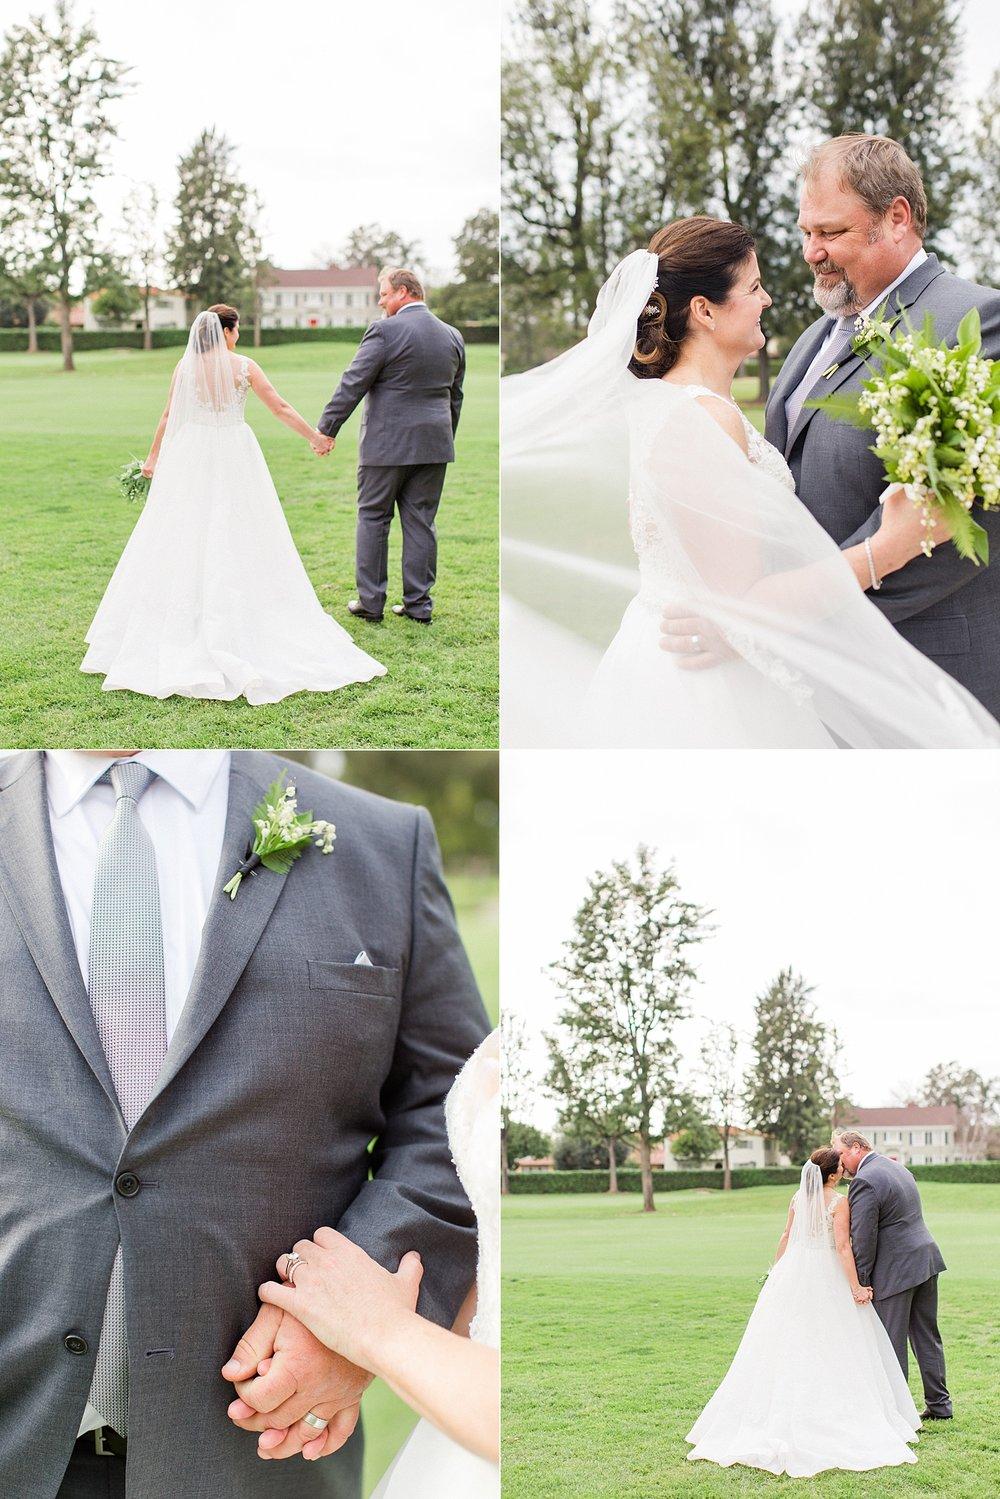 thevondys.com | Langham Pasadena | Los Angeles Wedding Photographer | The Vondys